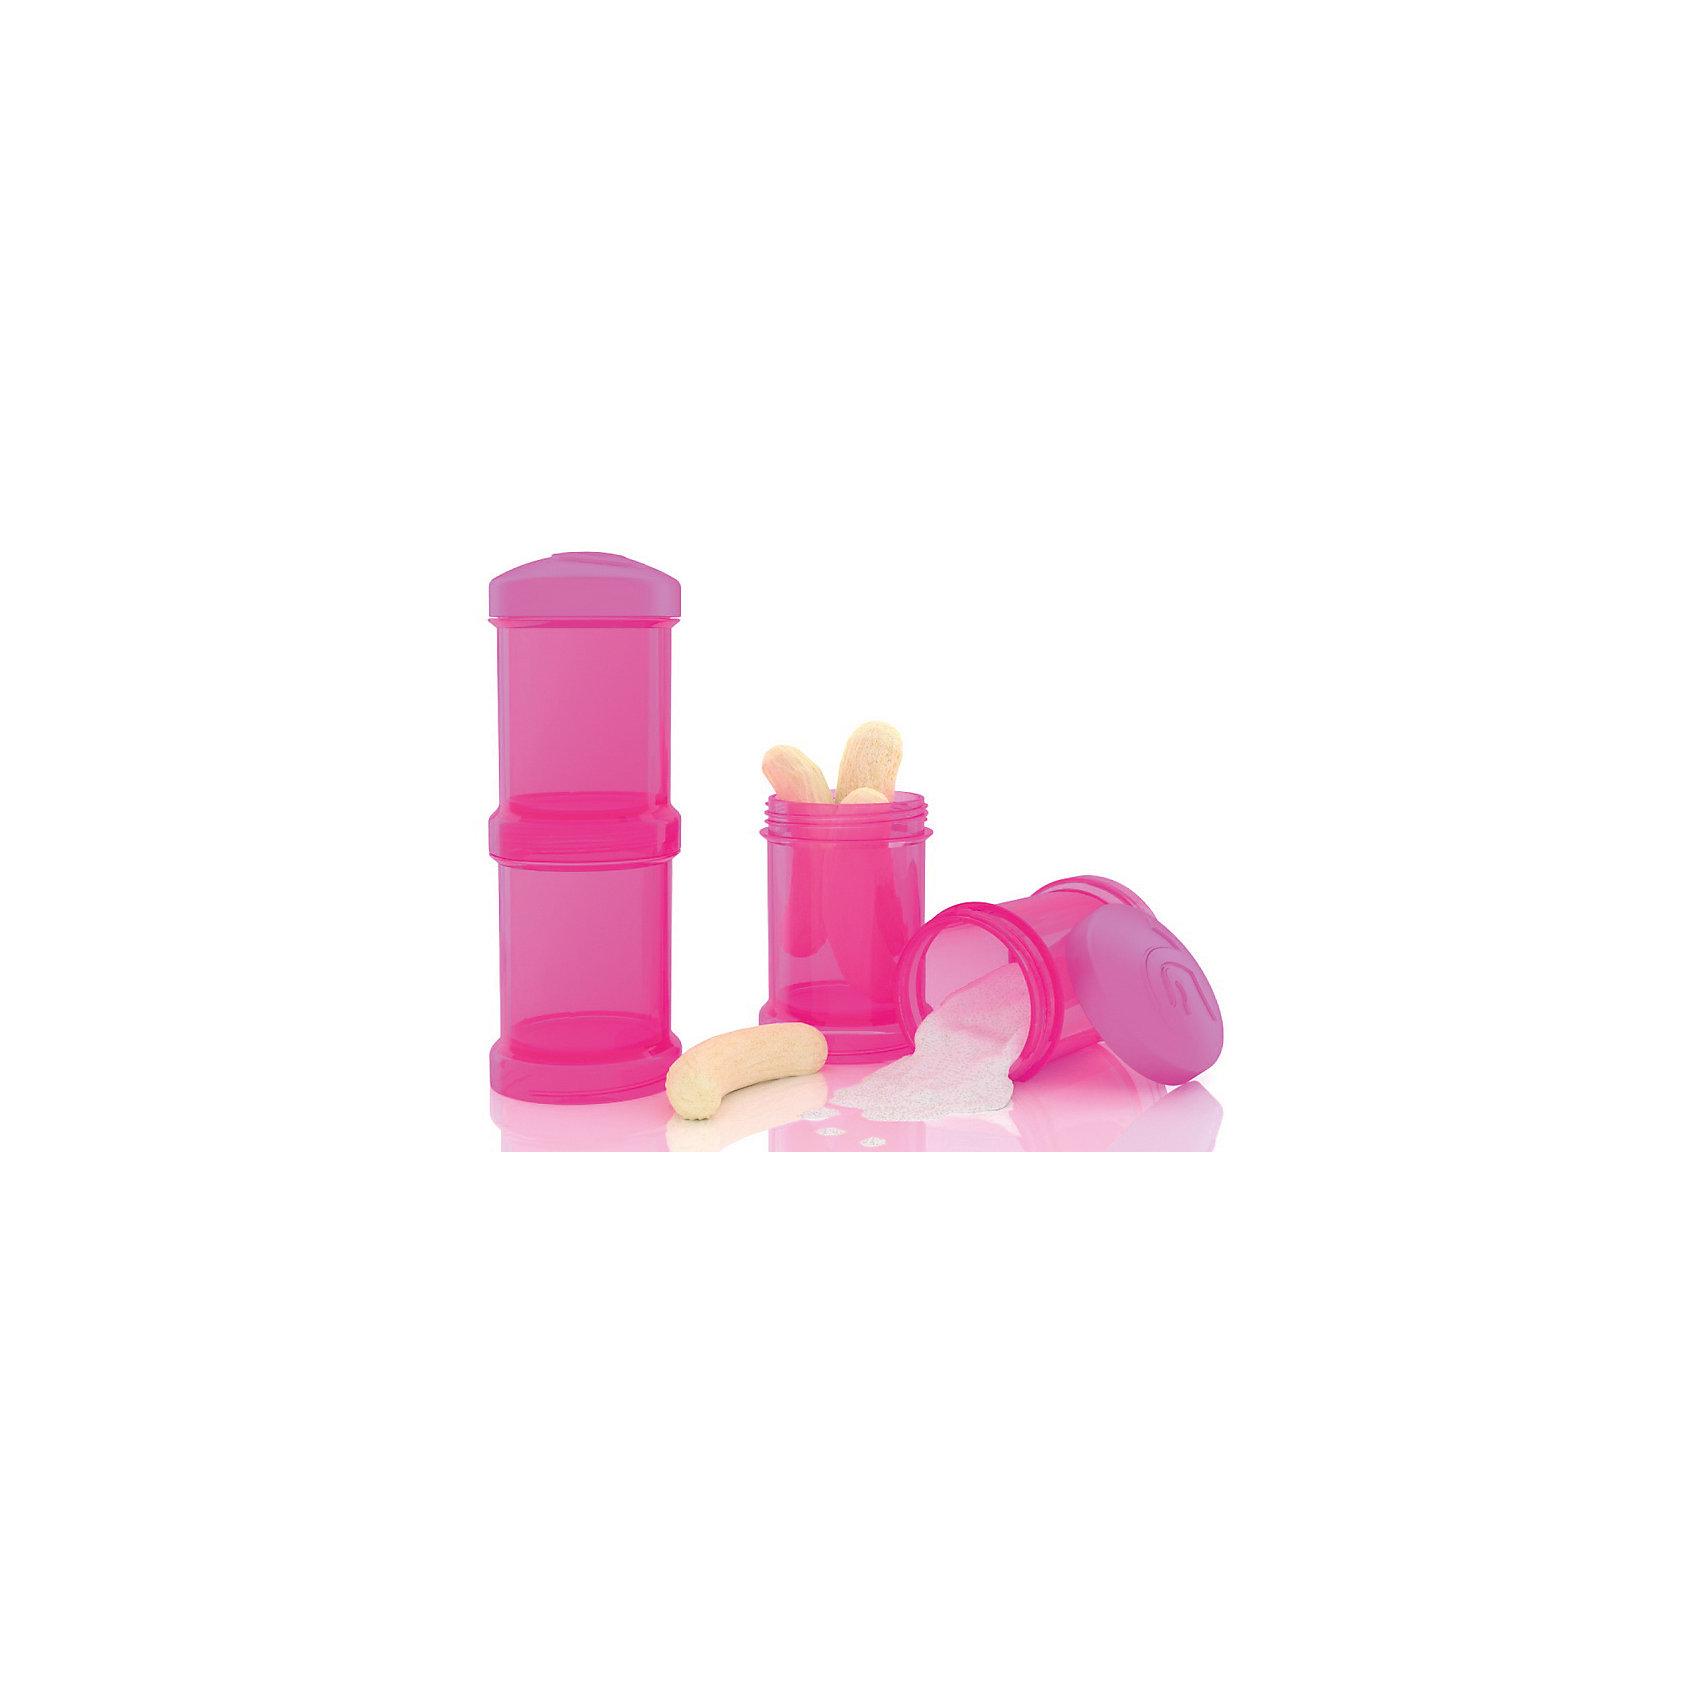 Контейнер для сухой смеси 100 мл. 2 шт., TwistShake, розовый (Twistshake)